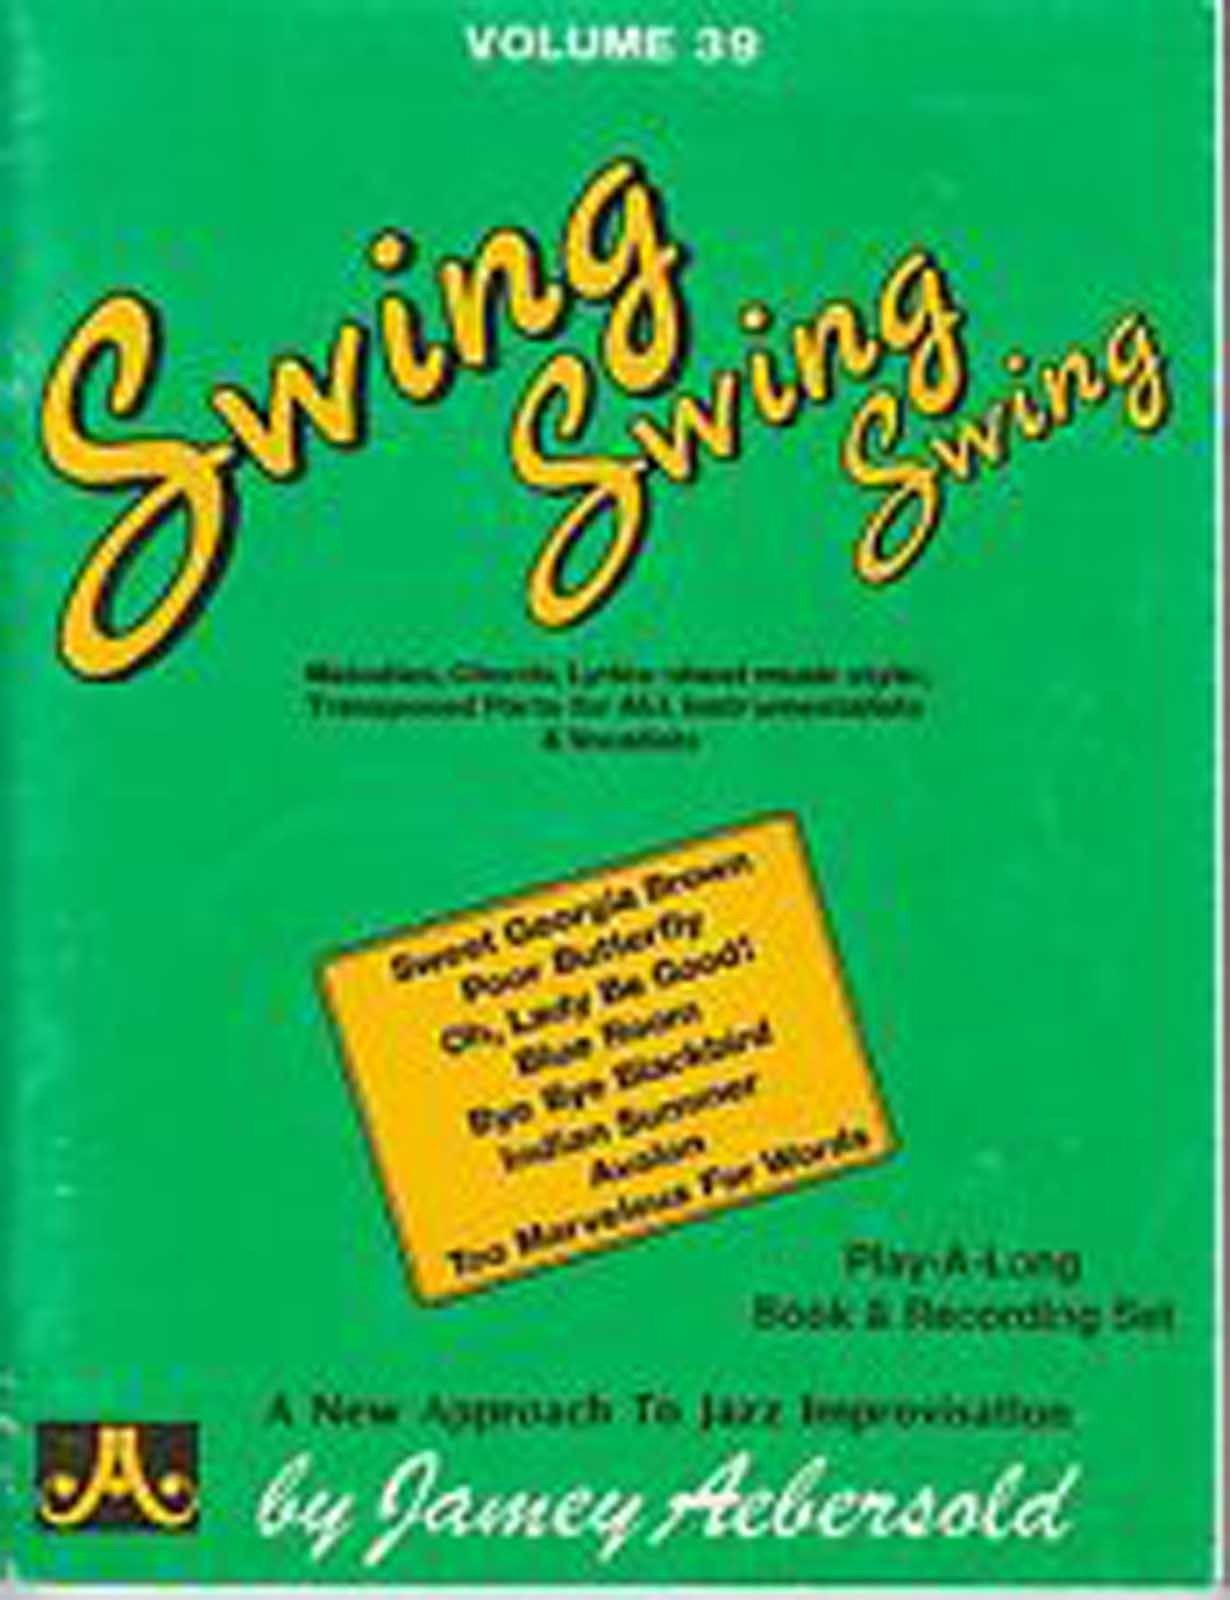 Swing Swing Swing Aebersold Lead Sheet Music Book Jazz Practice Improvising B84